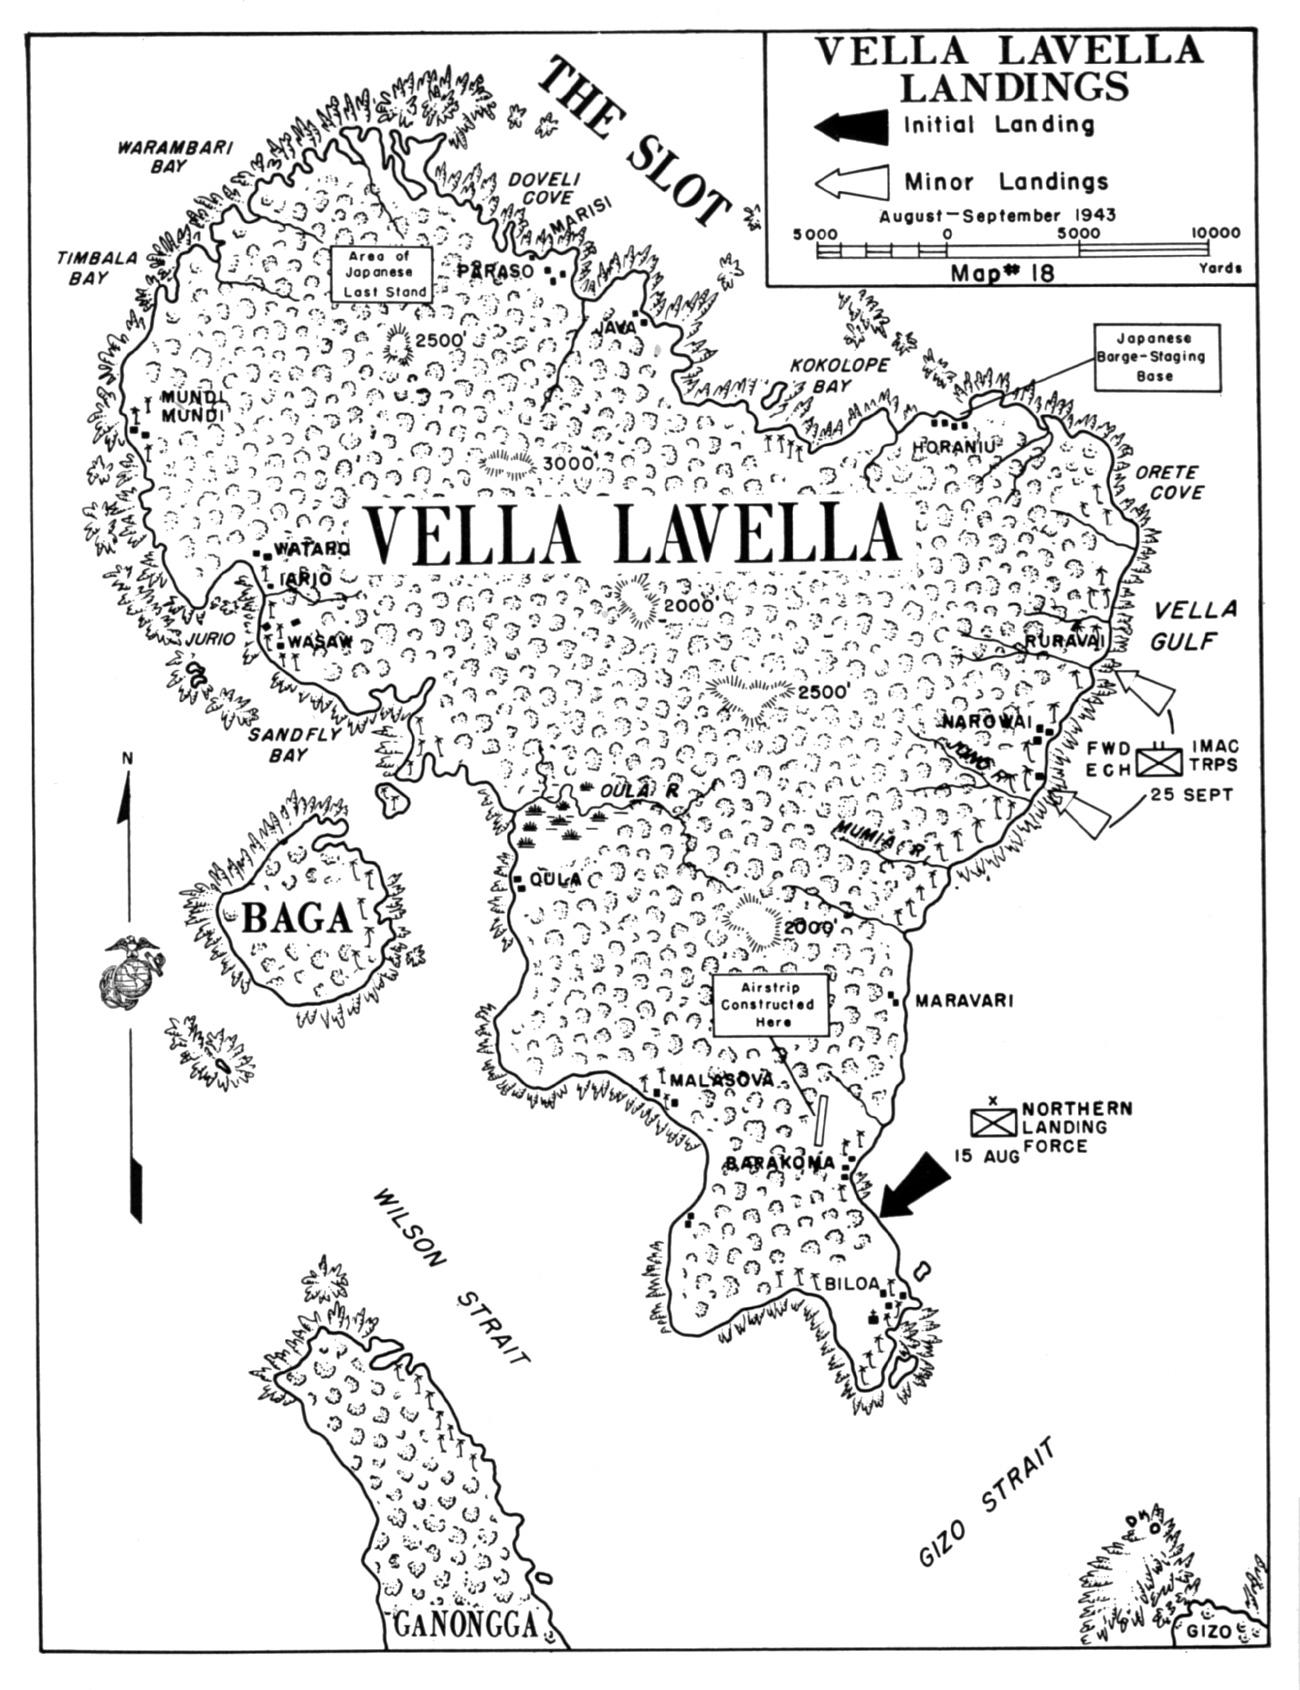 Operation Toenails Vella Lavella